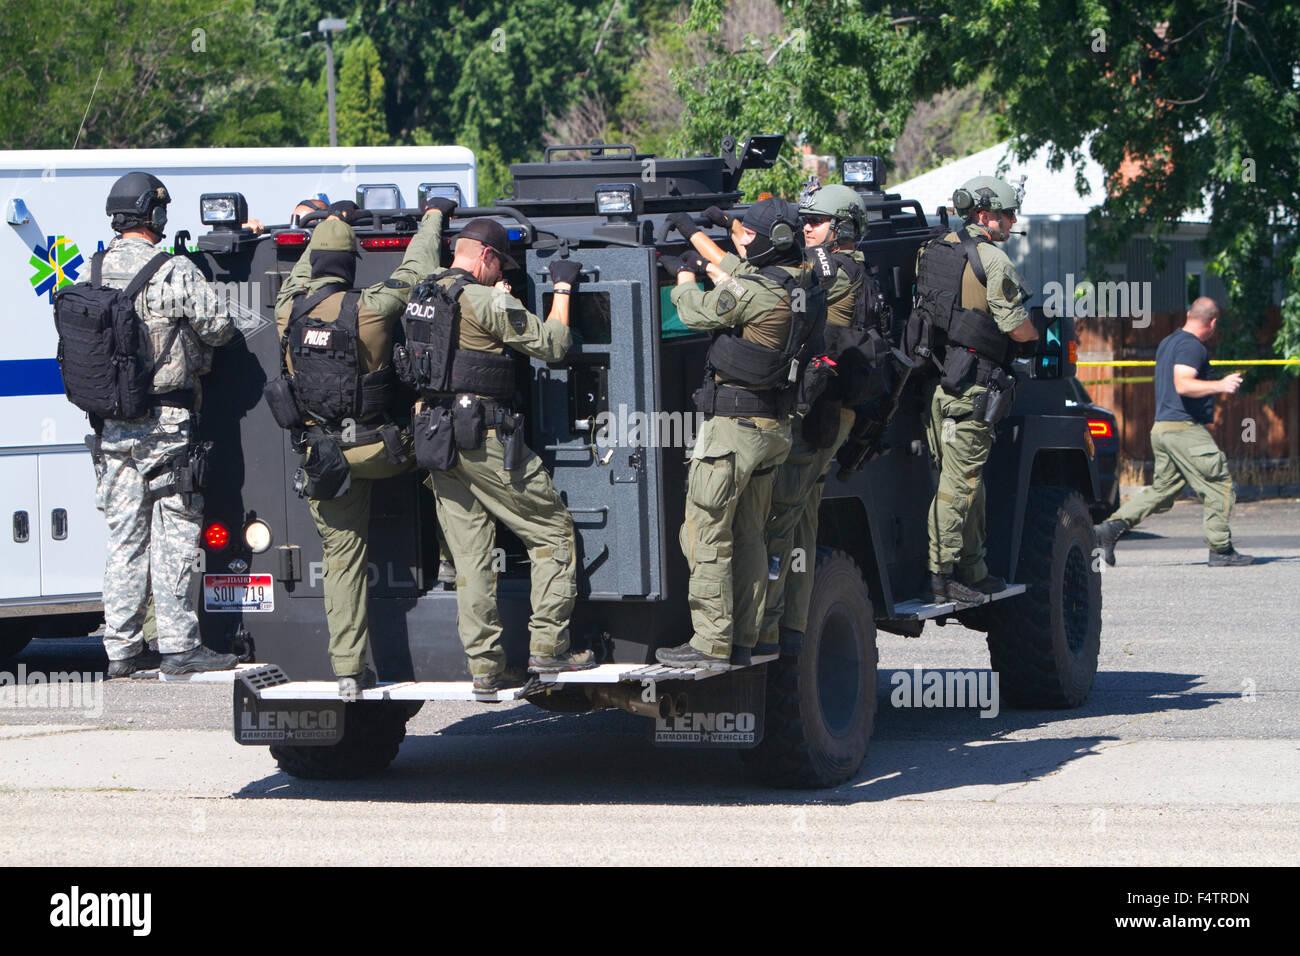 SWAT team in Boise, Idaho, USA. - Stock Image